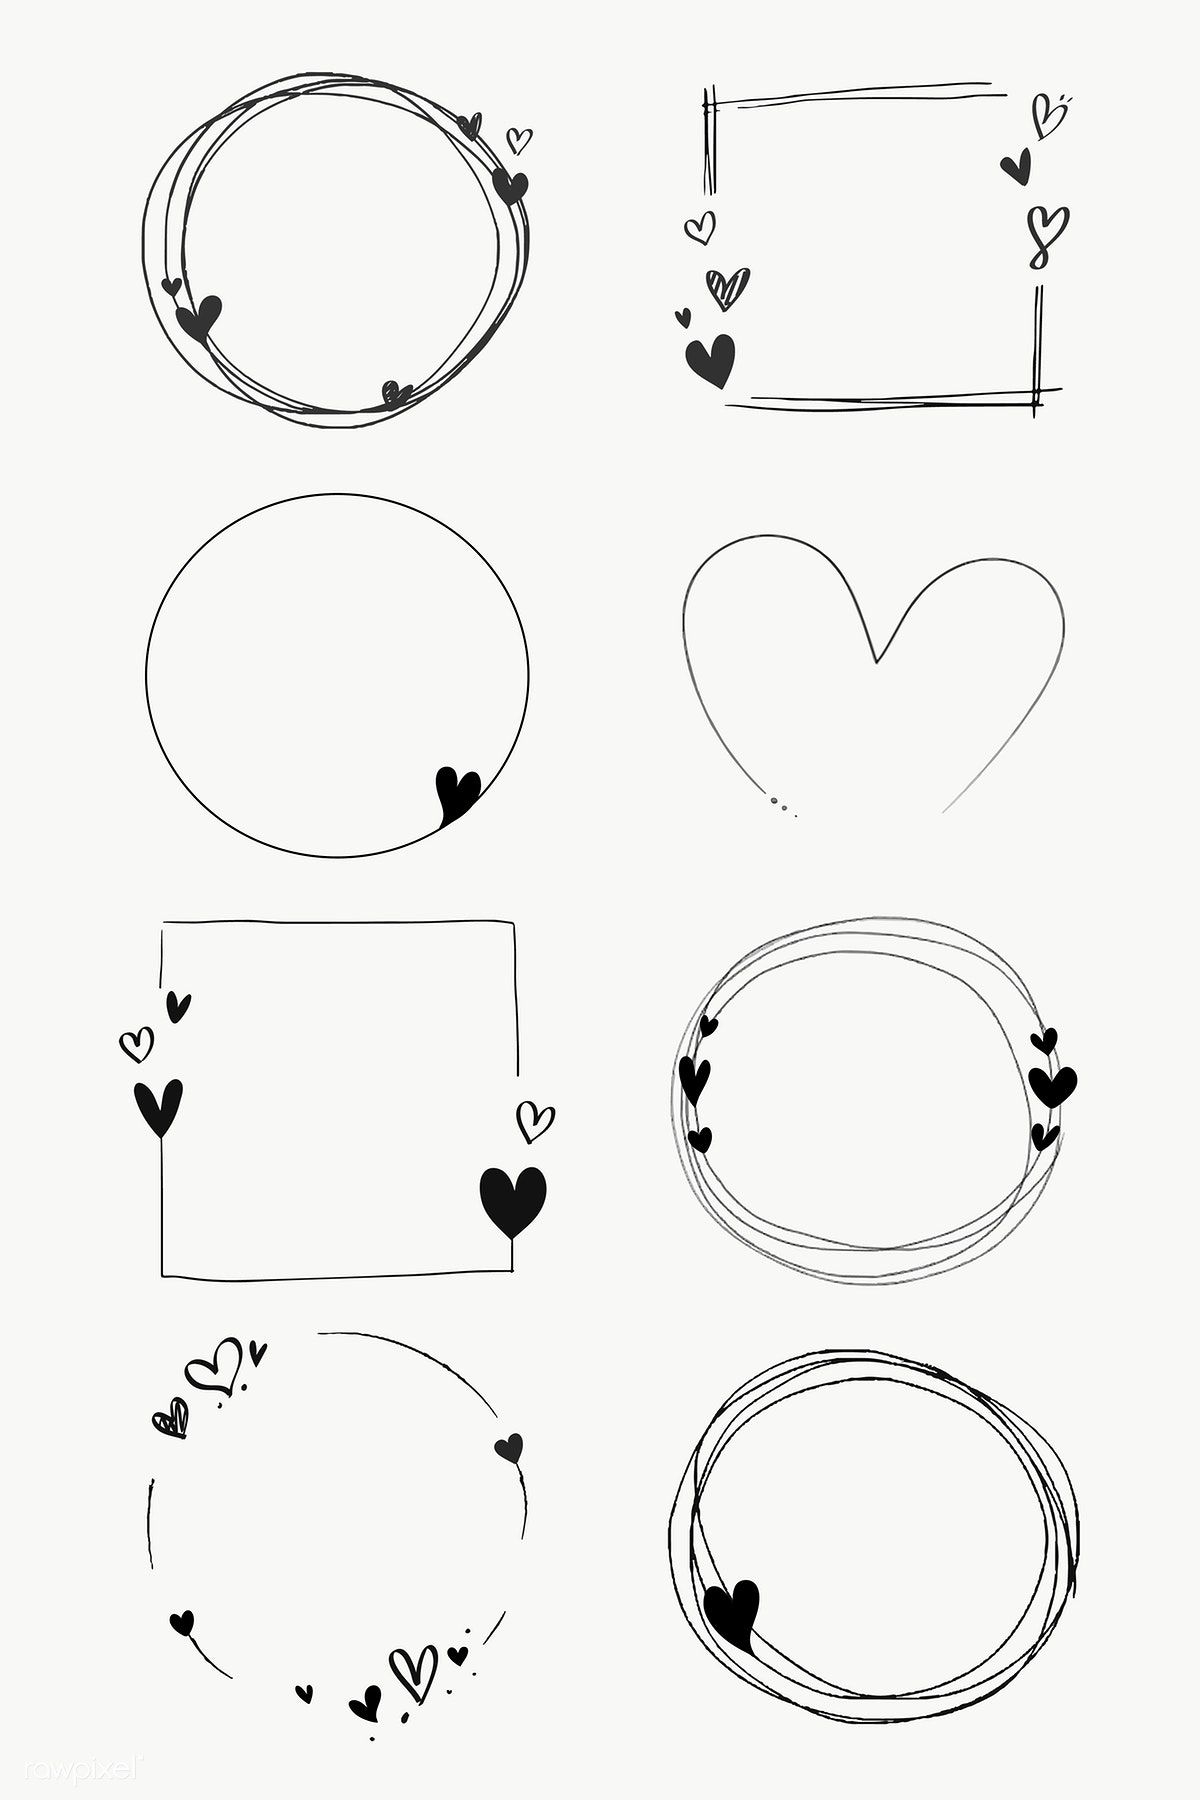 Download premium png of Doodle love frame collection transparent png